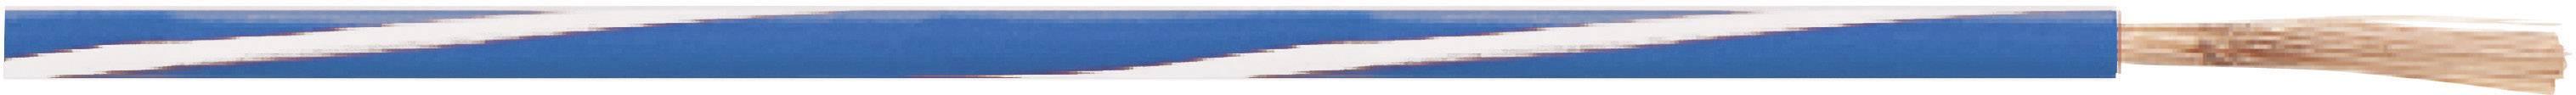 Opletenie / lanko LappKabel 4512322S X05V-K, 1 x 0.75 mm², vonkajší Ø 2.40 mm, metrový tovar, žltá, biela